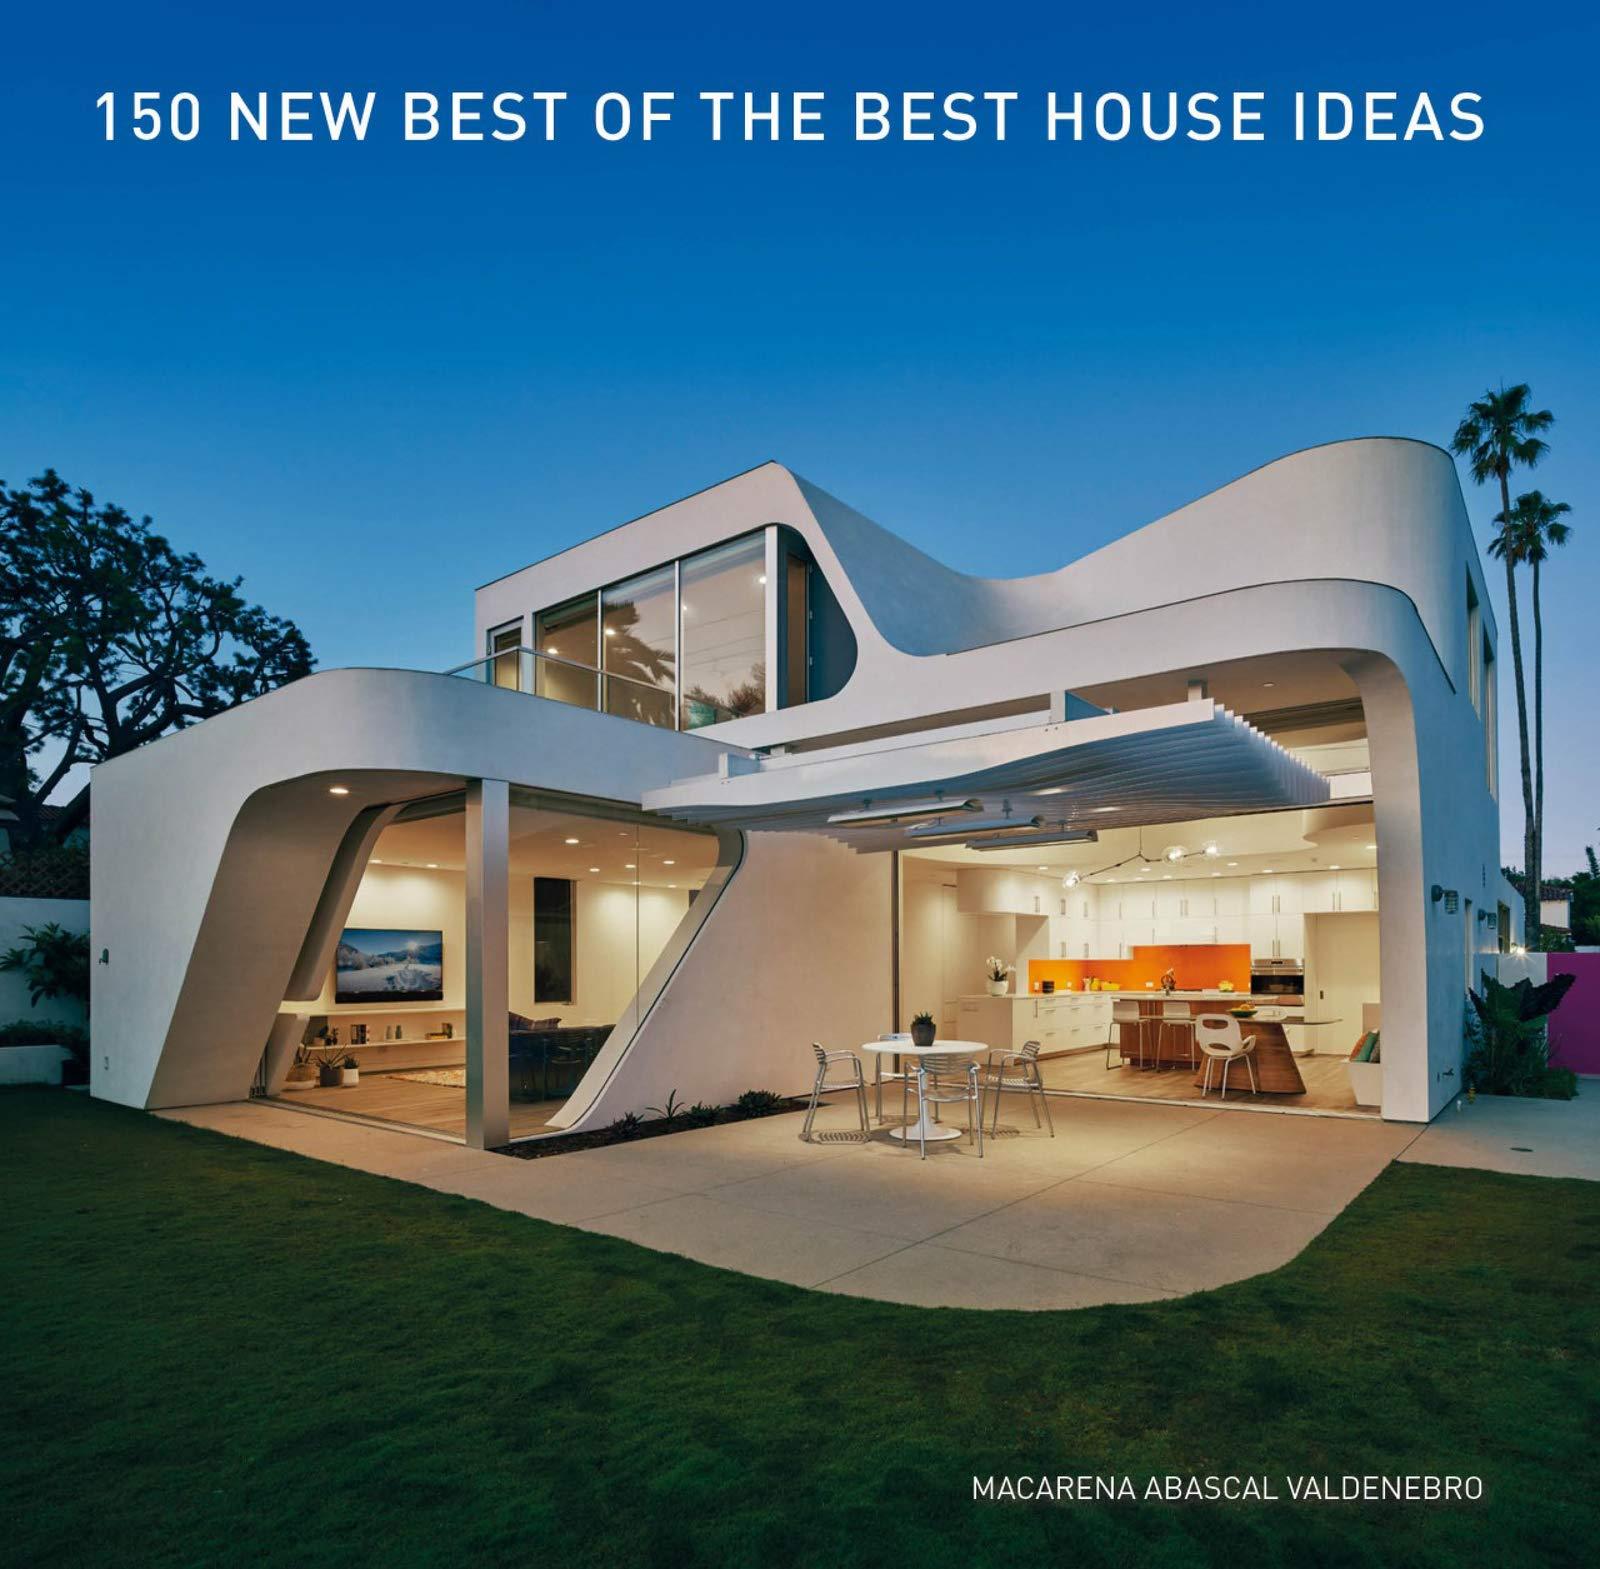 18 New Best of the Best House Ideas Abascal Valdenebro, Macarena ...